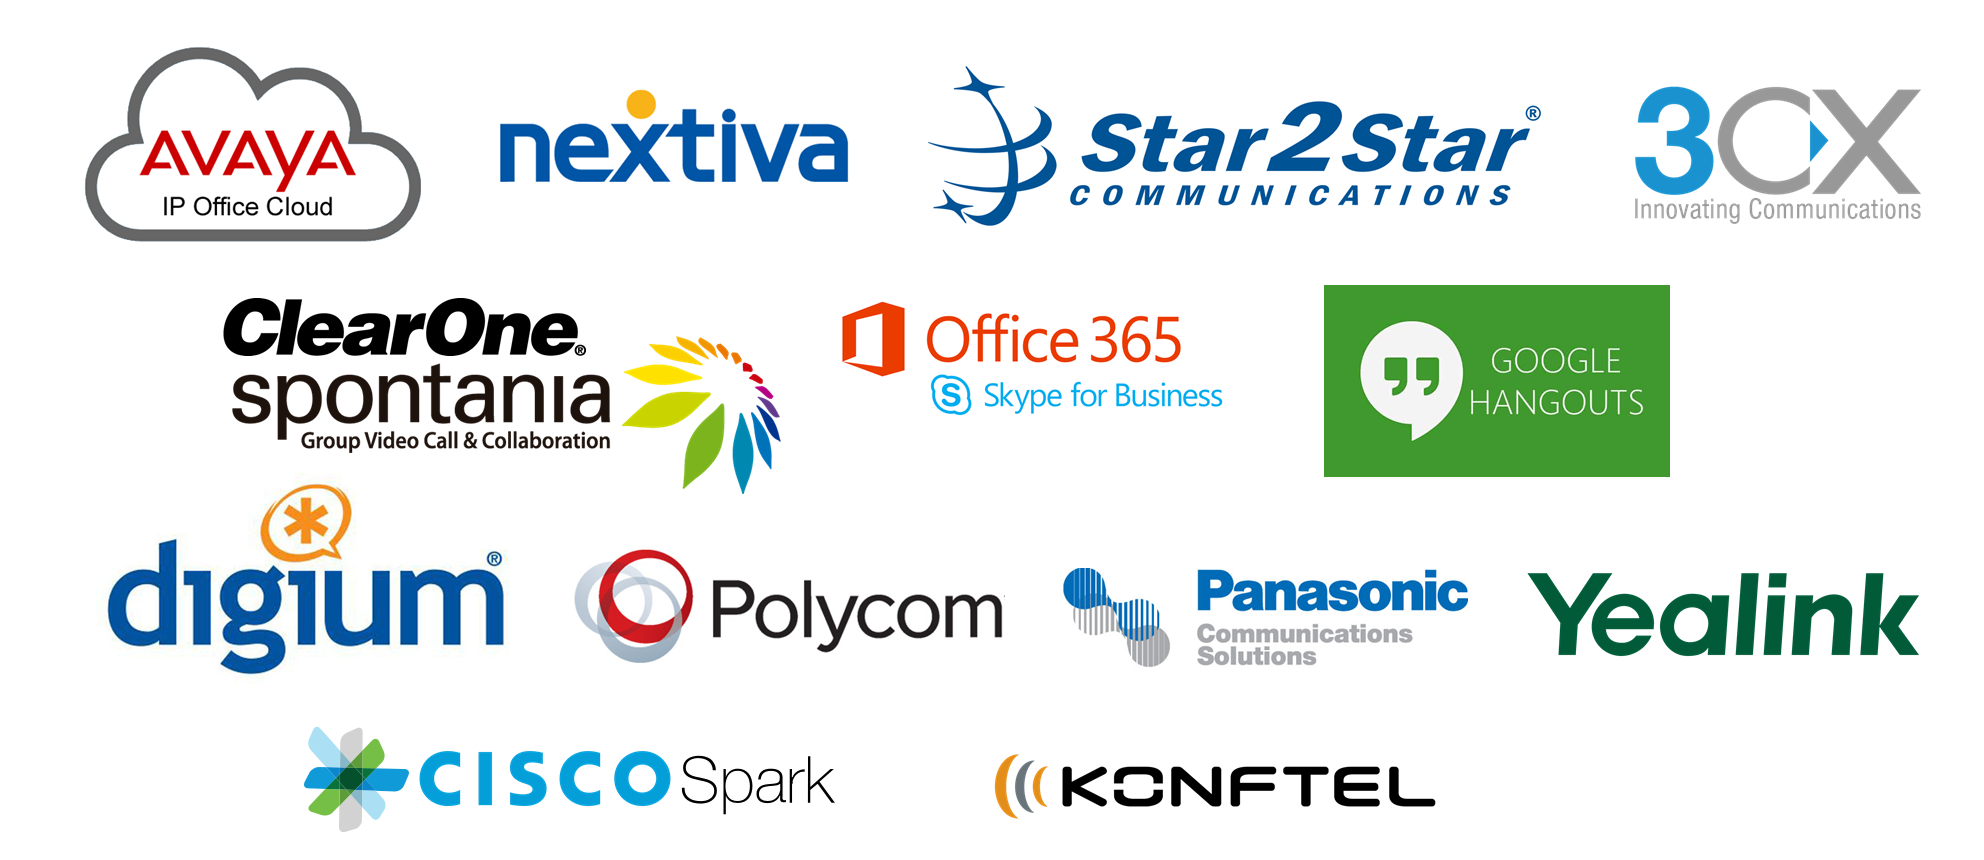 XS Cloud Voice Solutions - Avaya, Nextiva, Star2Star, 3CX, ClearOne, Office 365 Skype, Google Hangouts, Digium, Polycom, Panasonic, Yealink, Cisco, Konftel